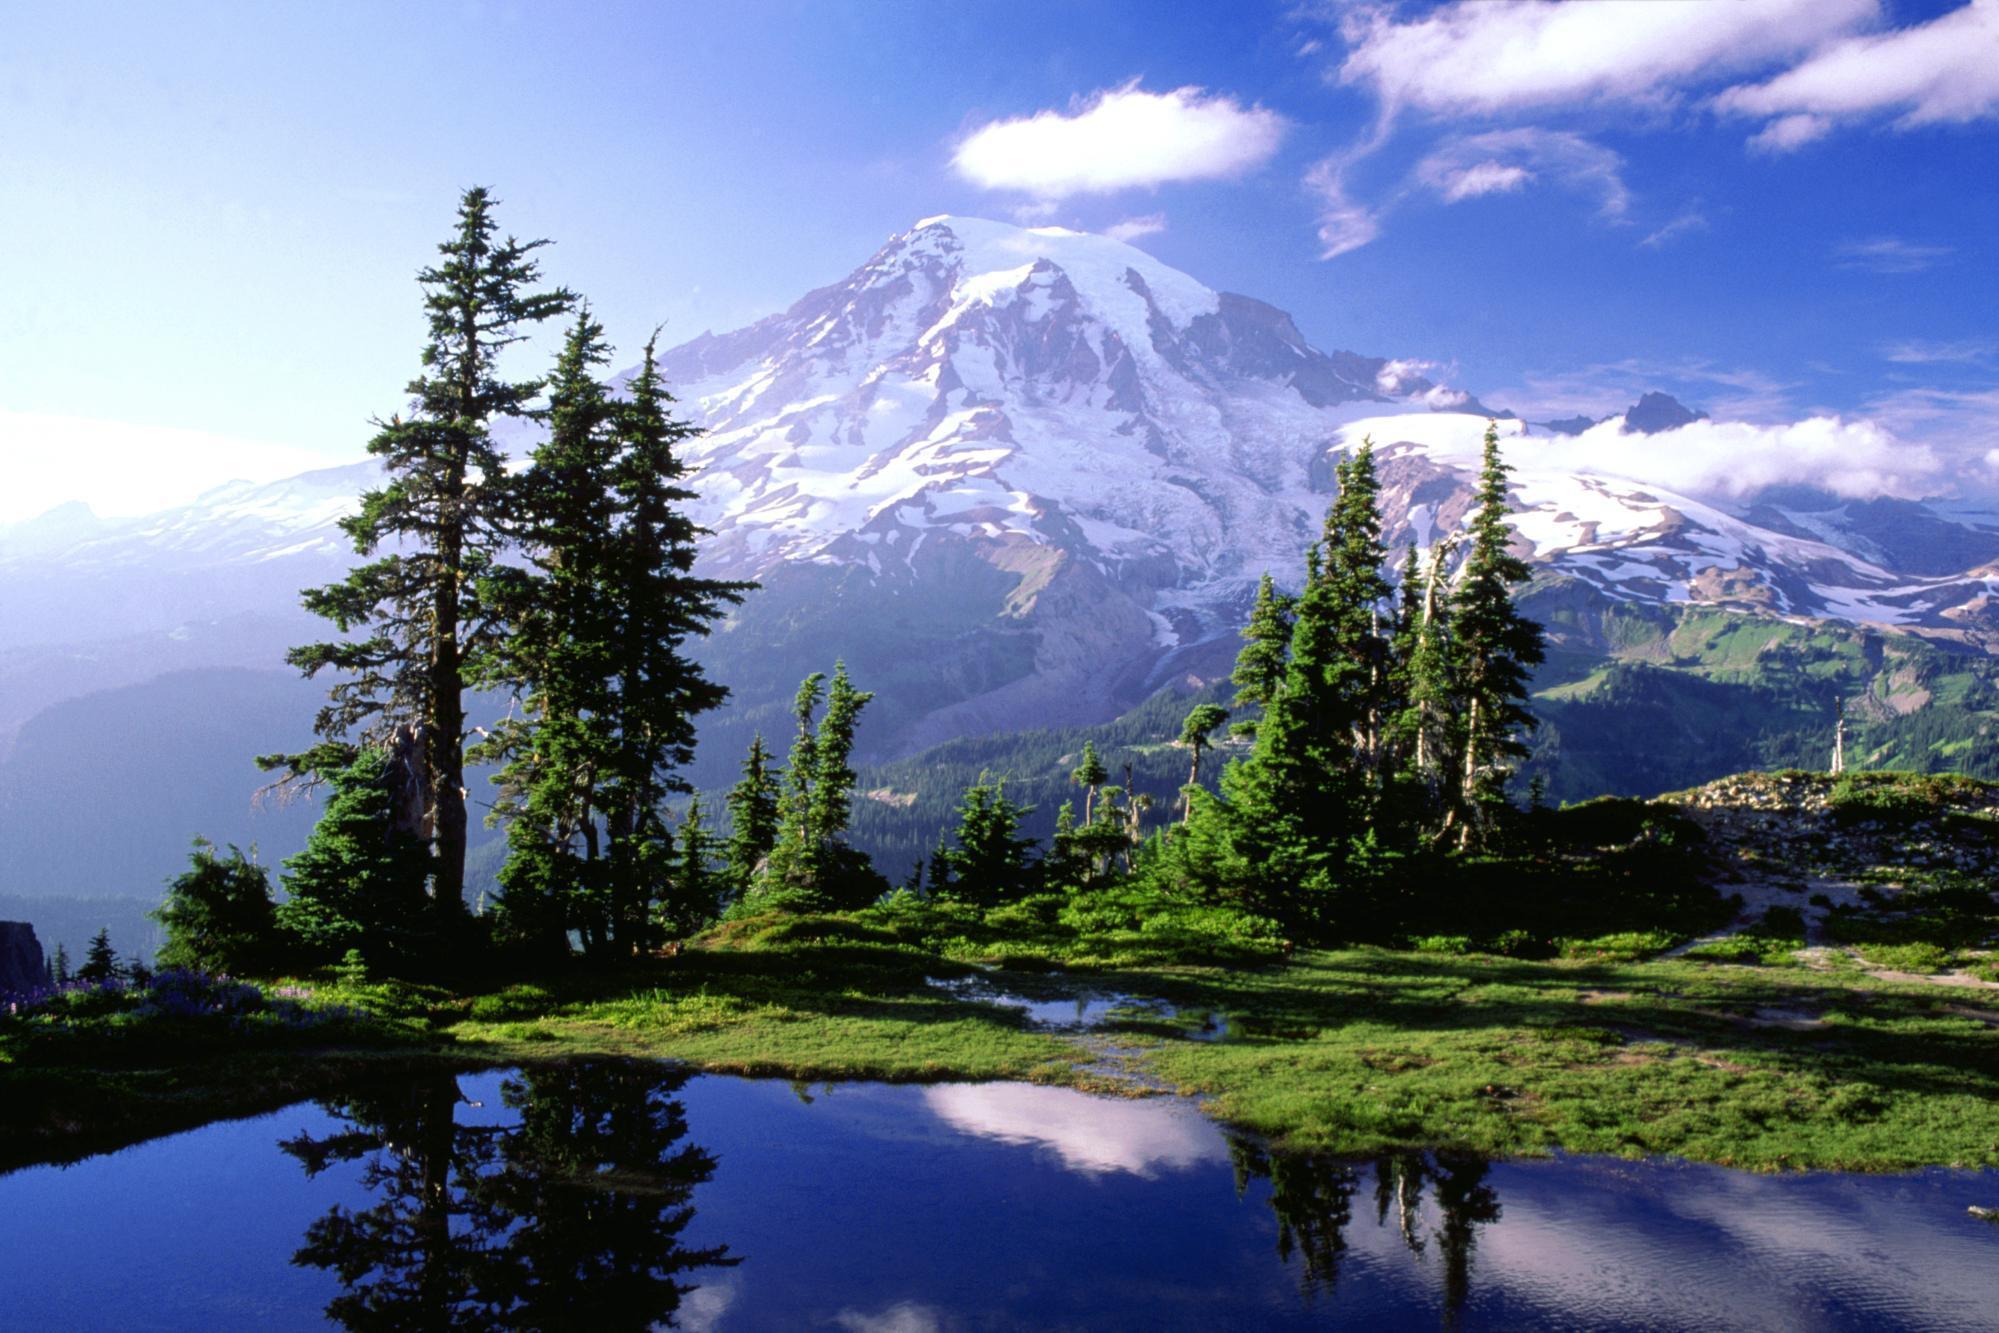 Mount Rainier National Park Wallpapers 1999x1333